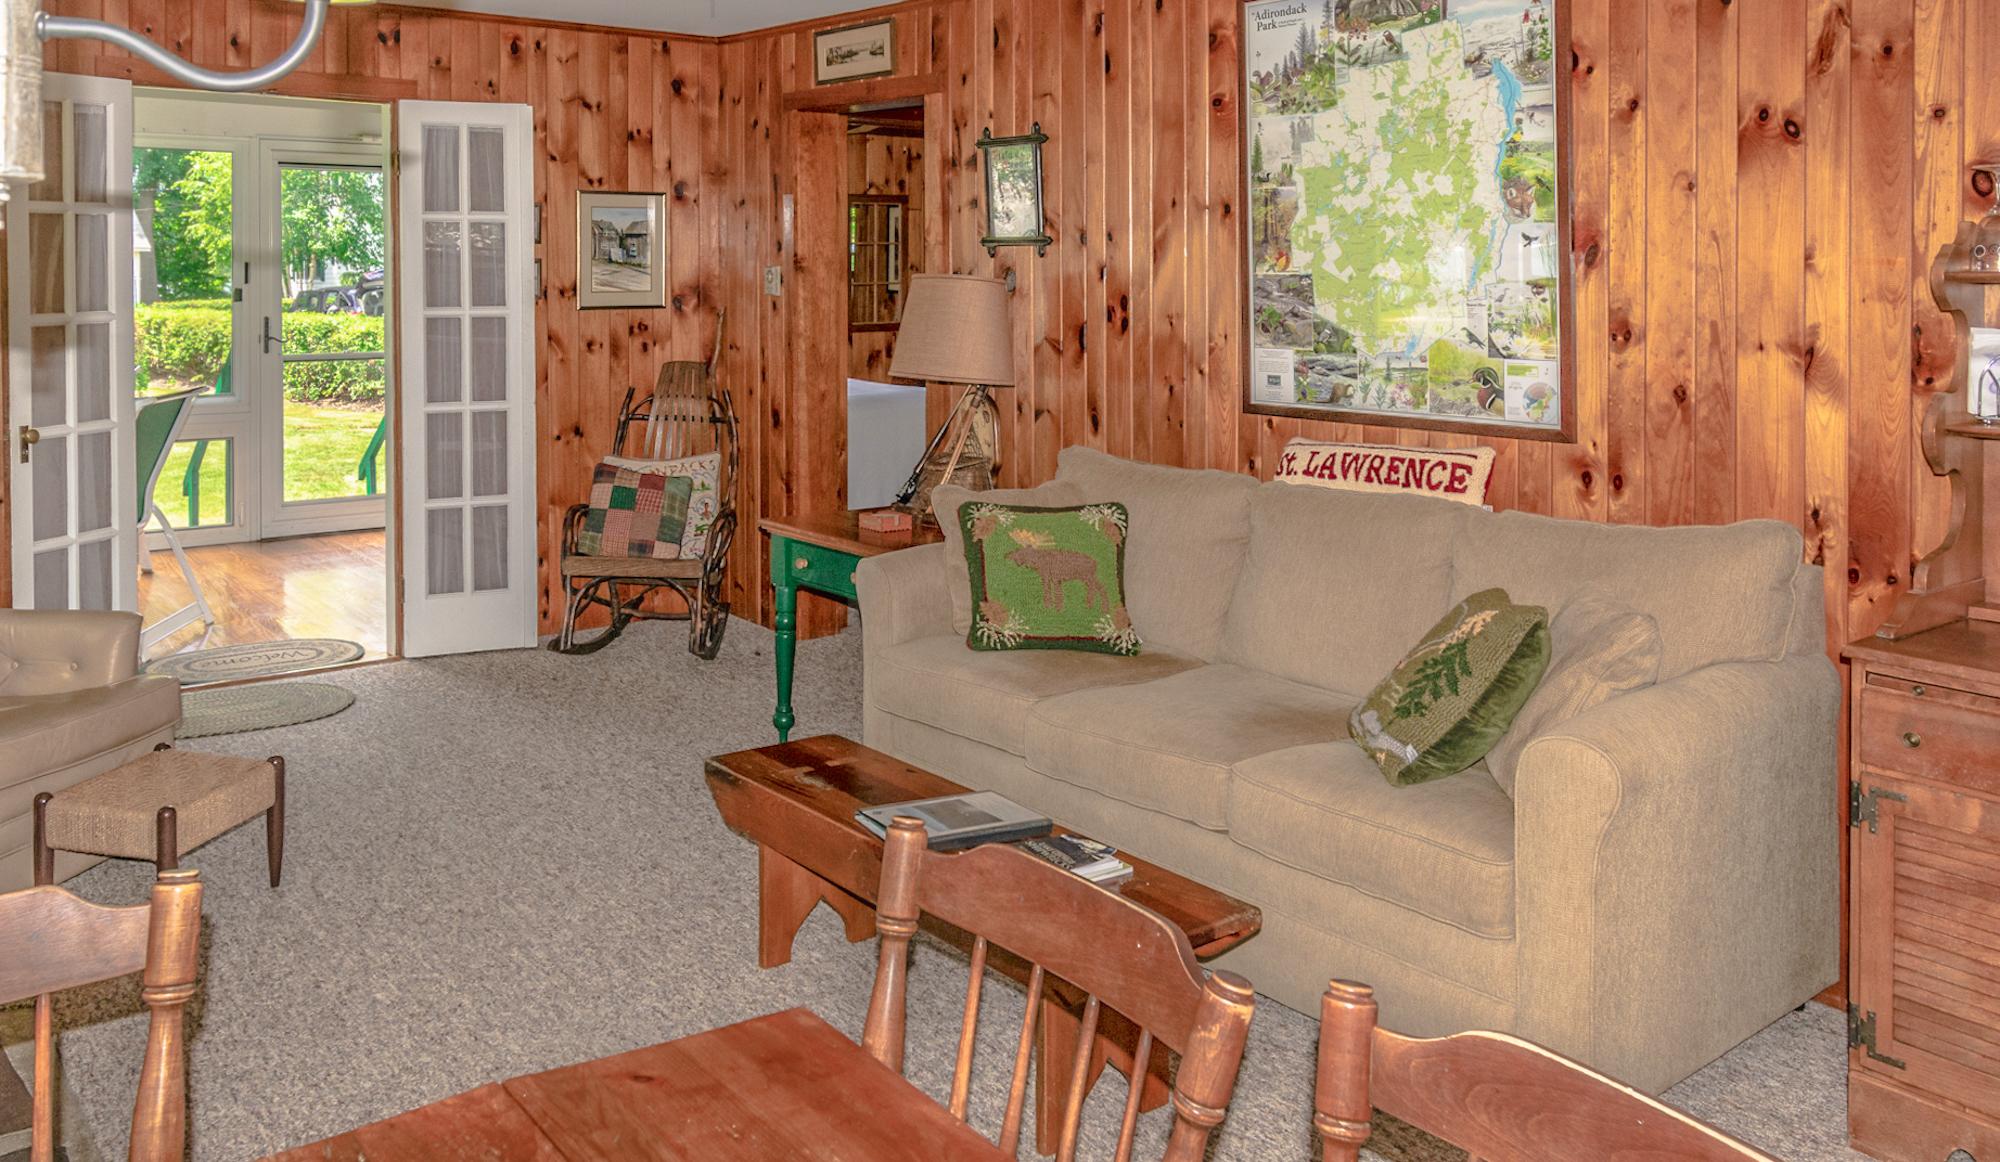 Takundewide Cottage #11 LivRoomJul2019DSC_0230